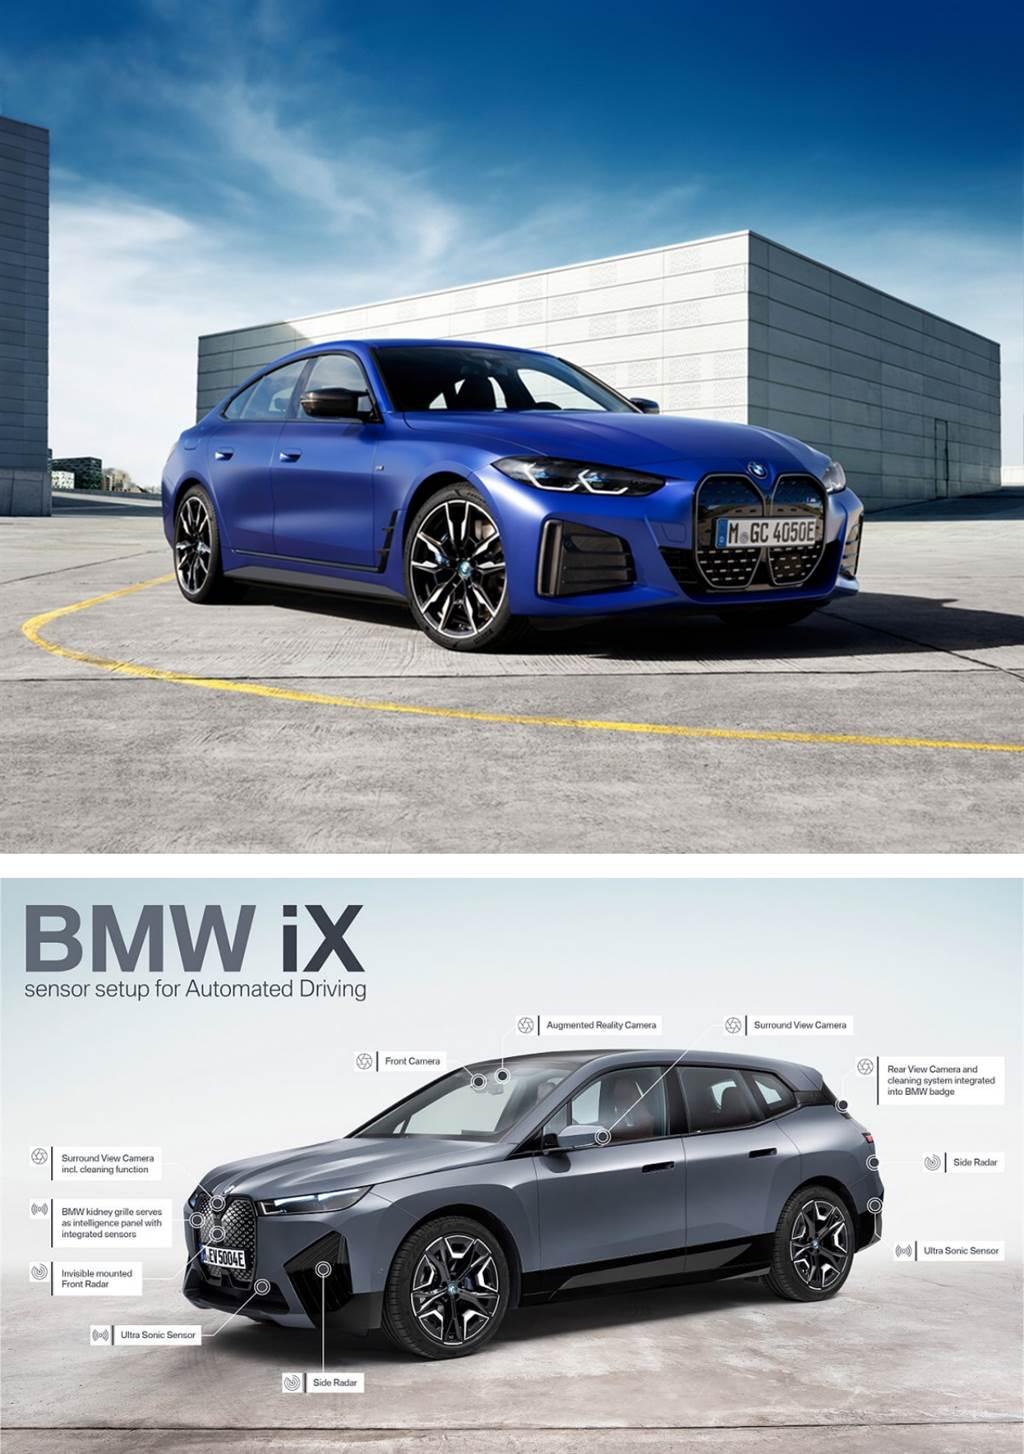 BMW iX、i4台灣販售資訊流出 配備AR鏡頭、引進i4 M50